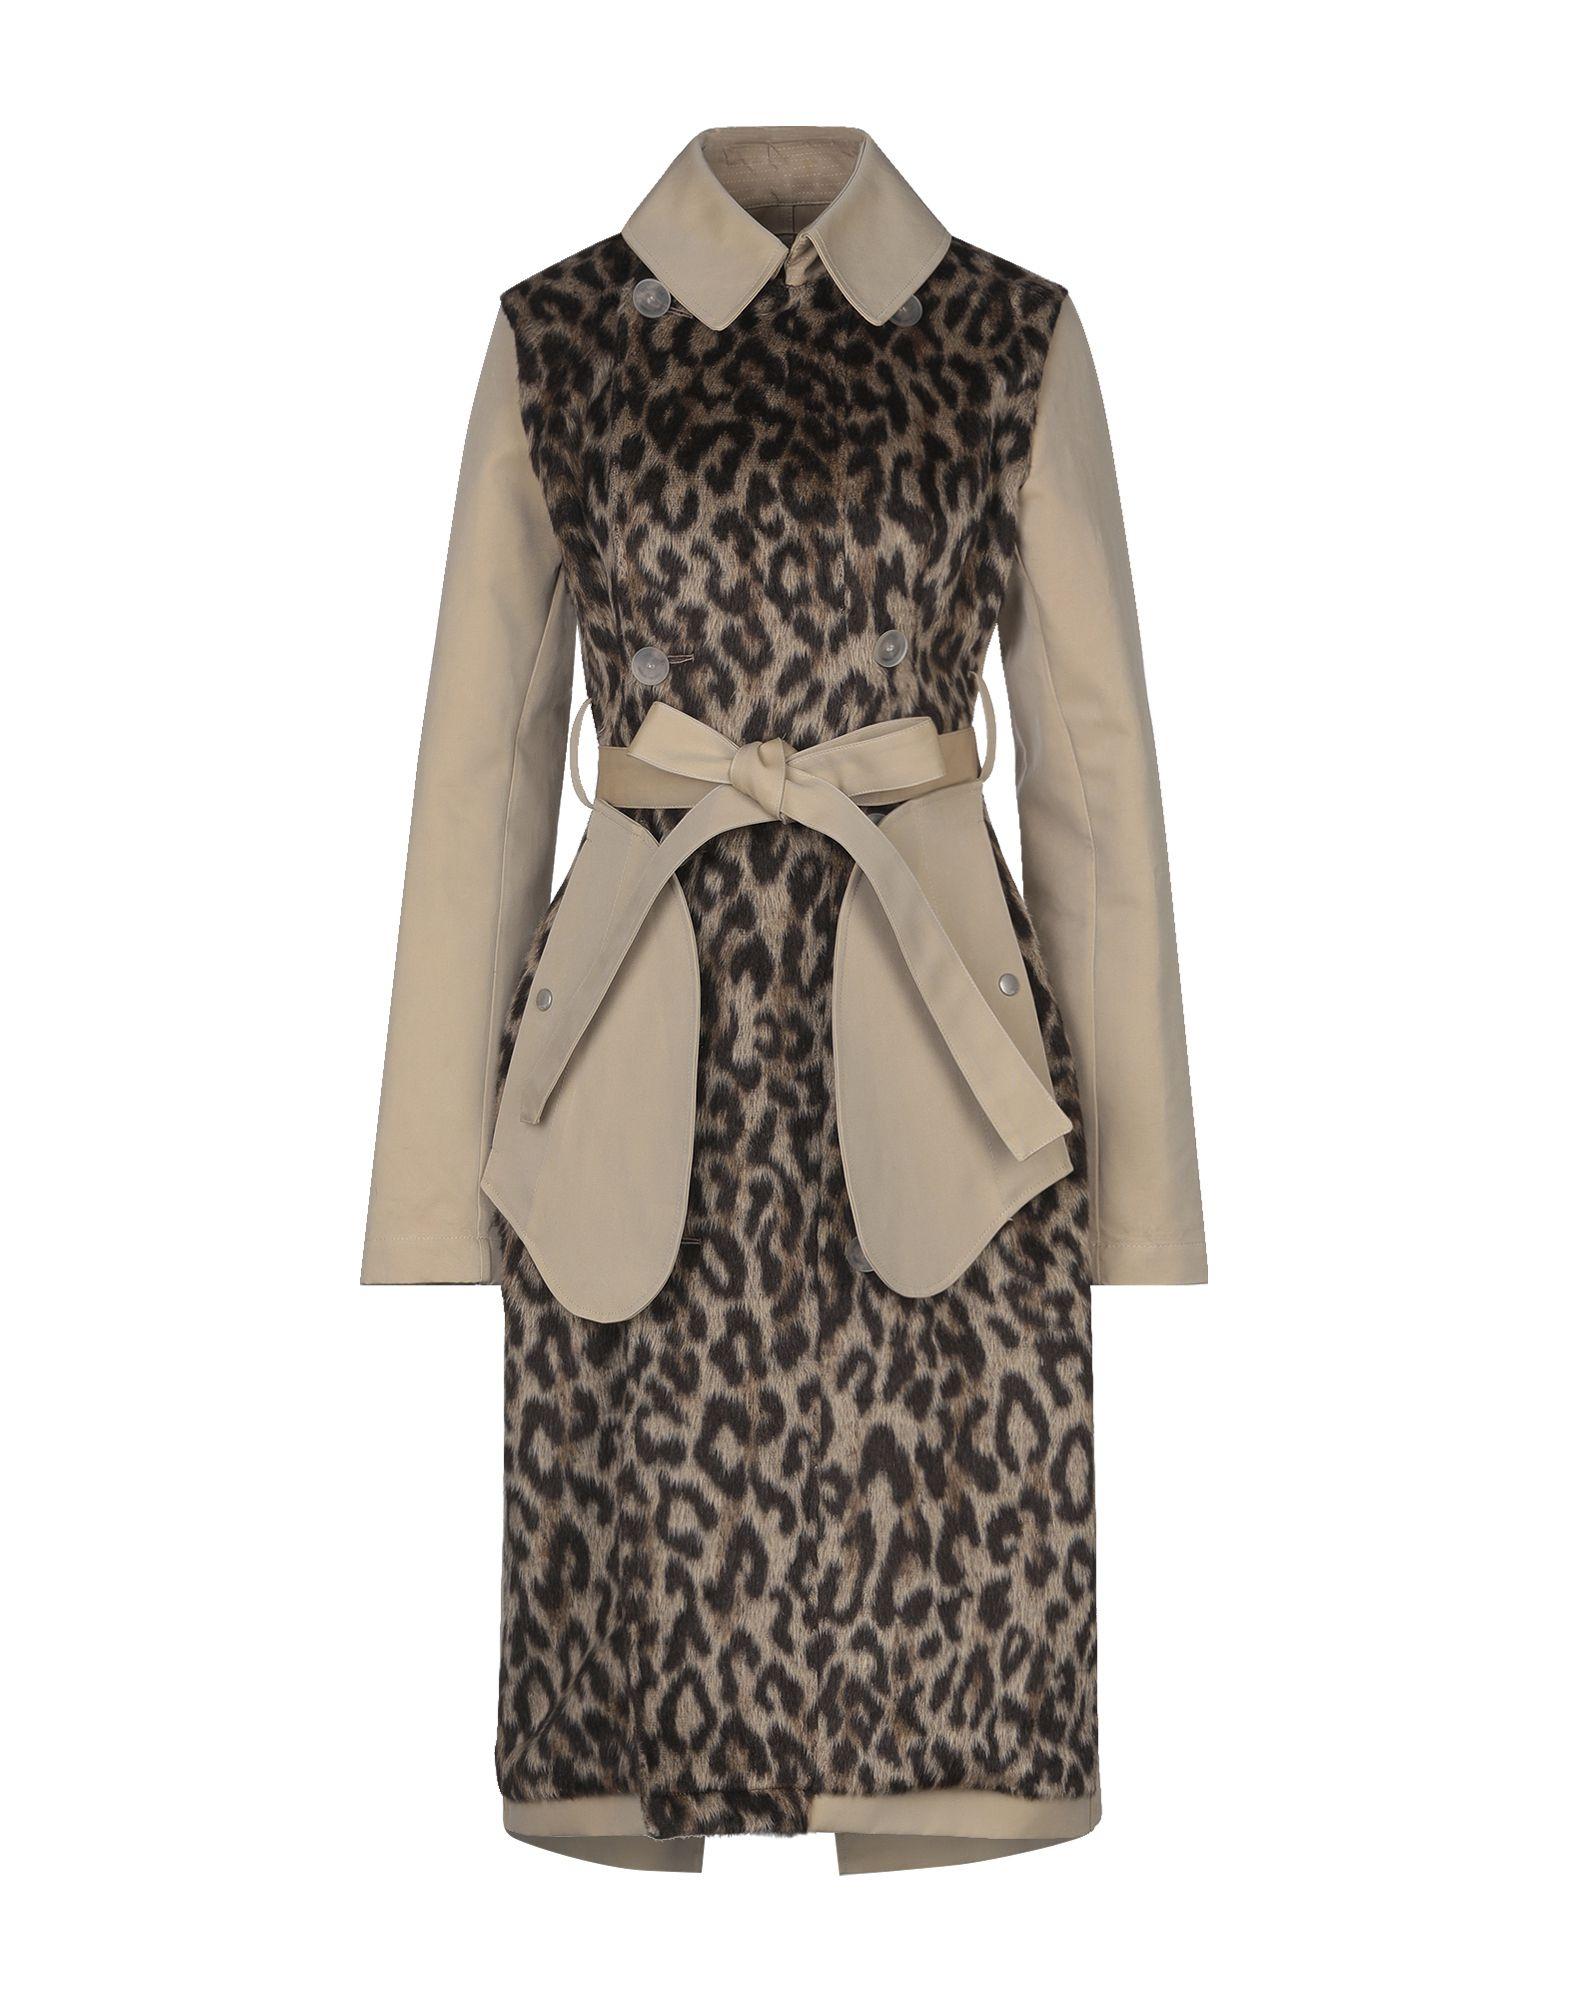 BEN TAVERNITI™ UNRAVEL PROJECT Легкое пальто